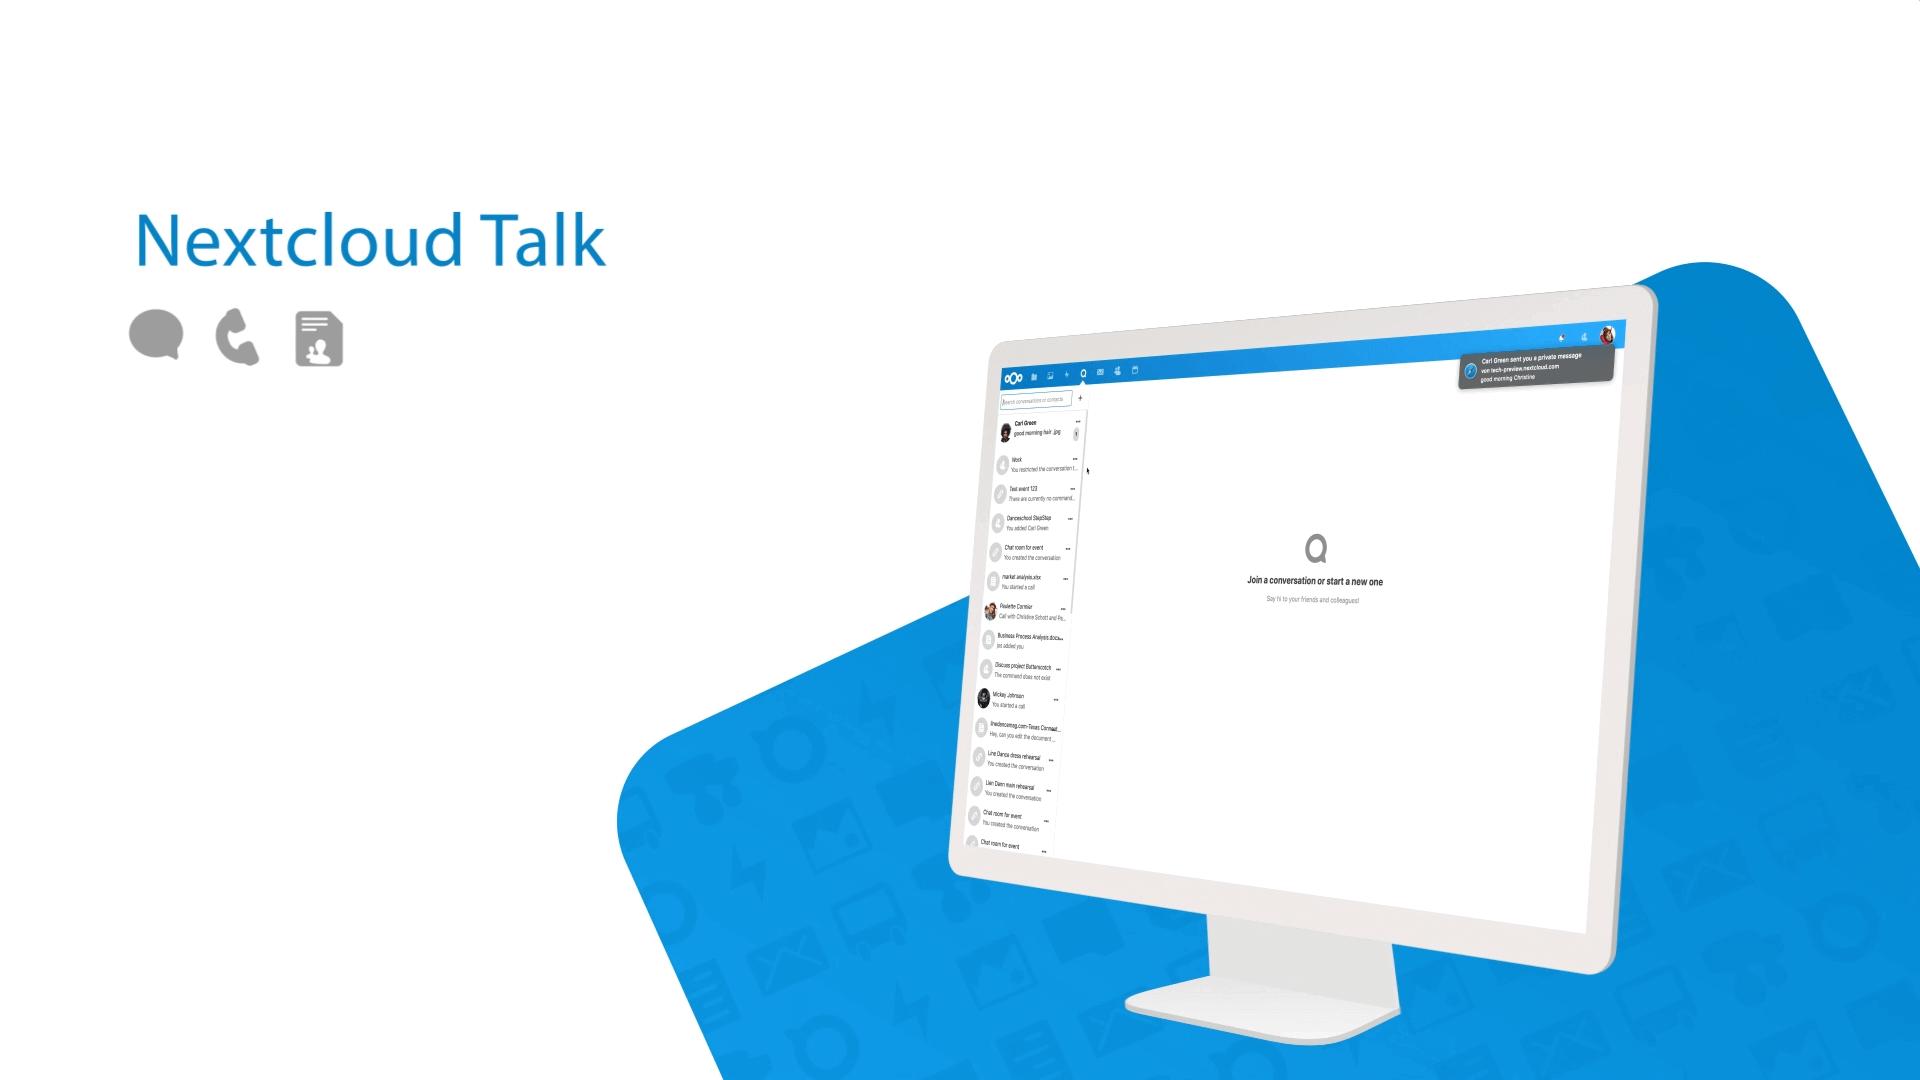 promo image of Nextcloud Talk